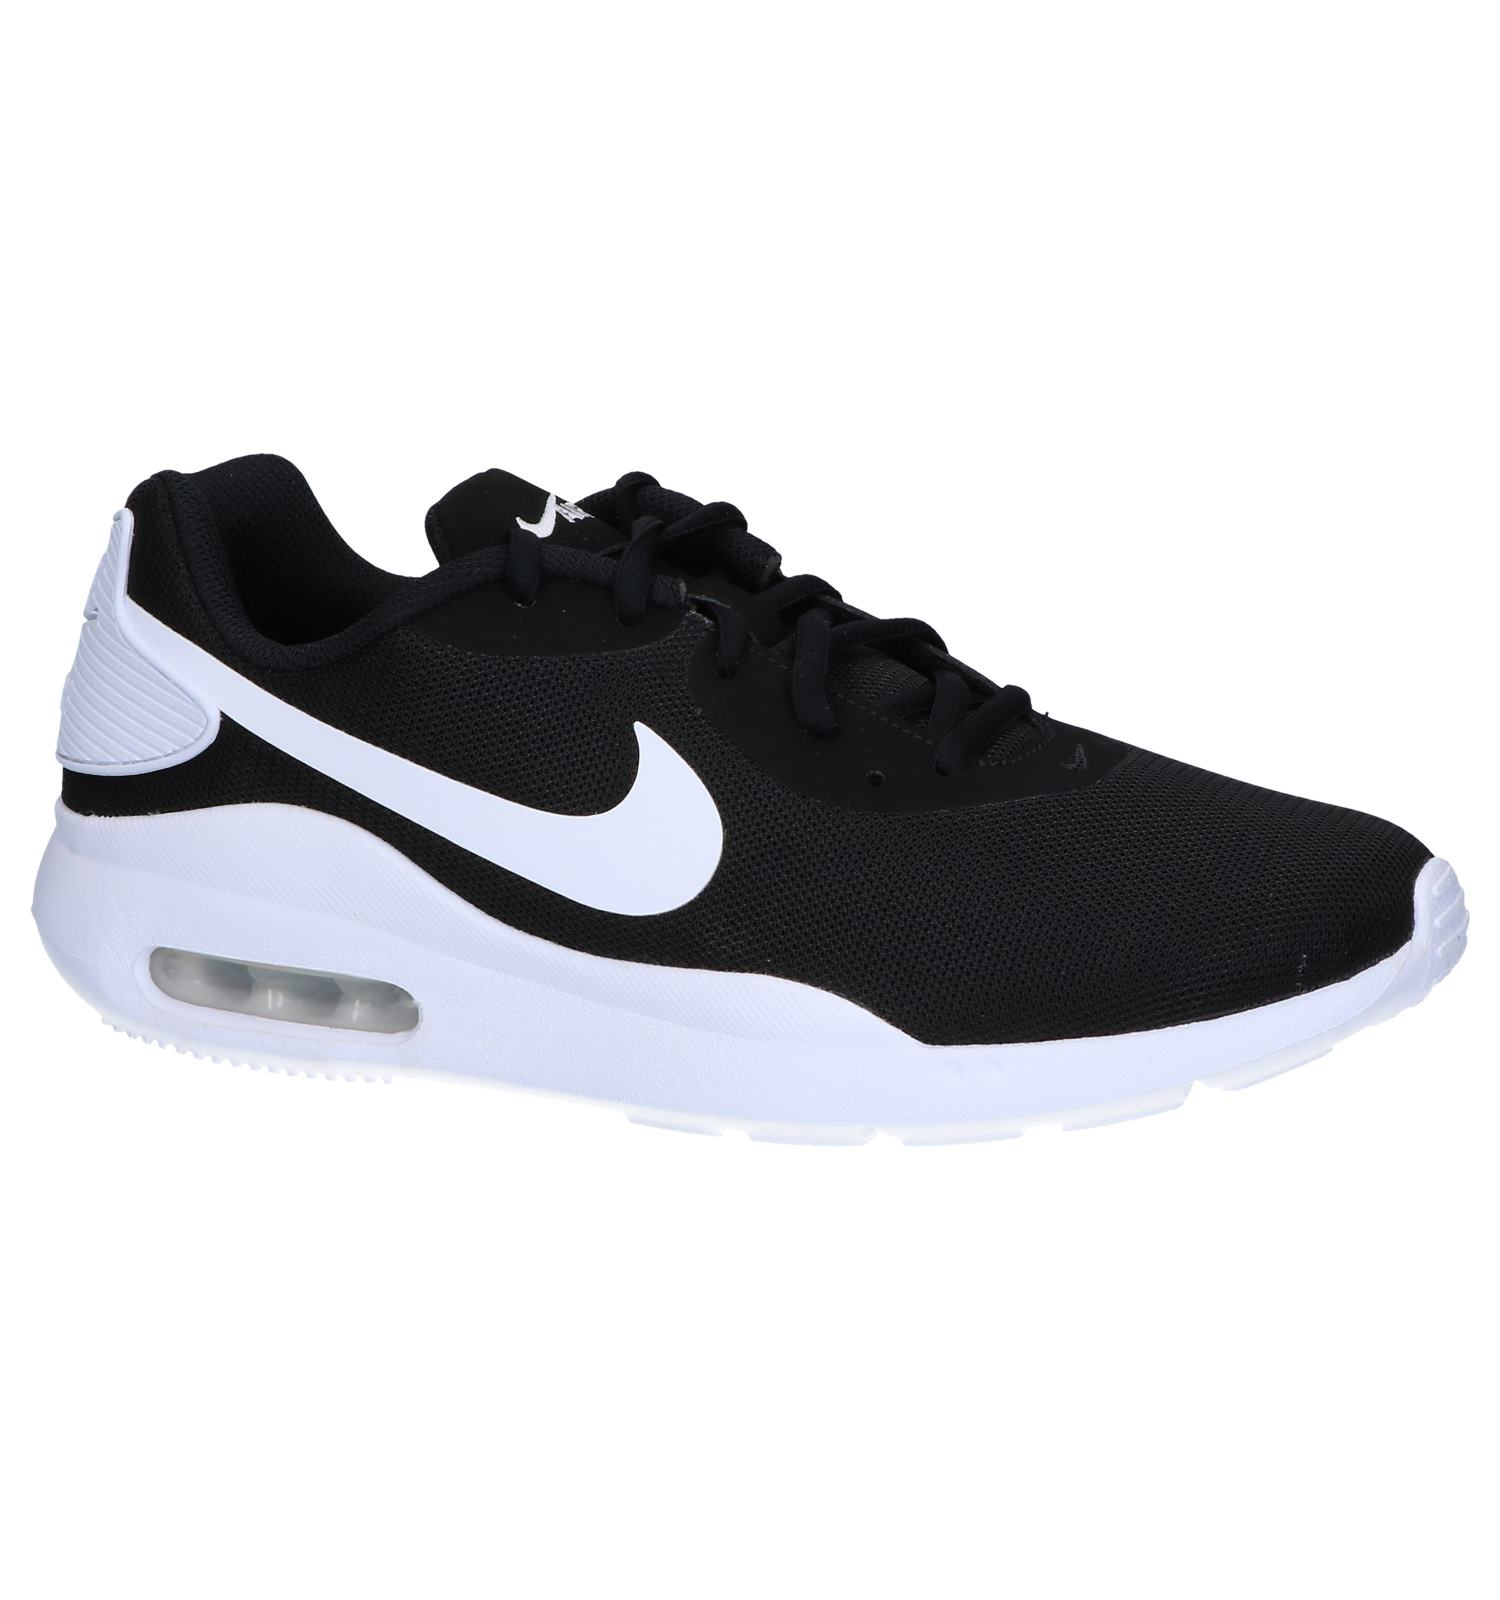 fc18c07ae55 Zwarte Sneakers Nike Air Max Oketo | TORFS.BE | Gratis verzend en retour